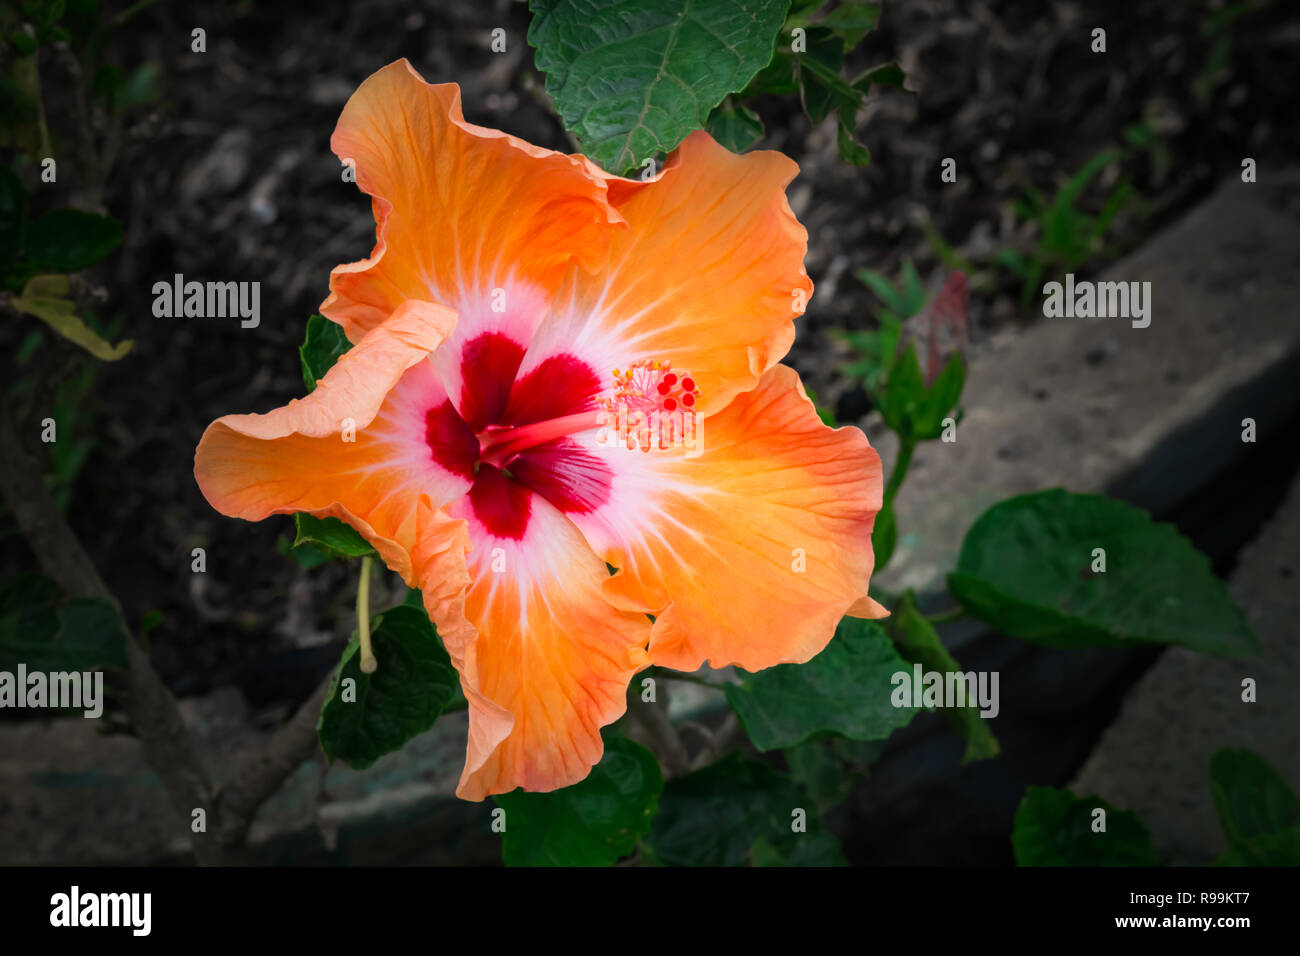 Wild Hibiscus Flower Co Stock Photos Wild Hibiscus Flower Co Stock